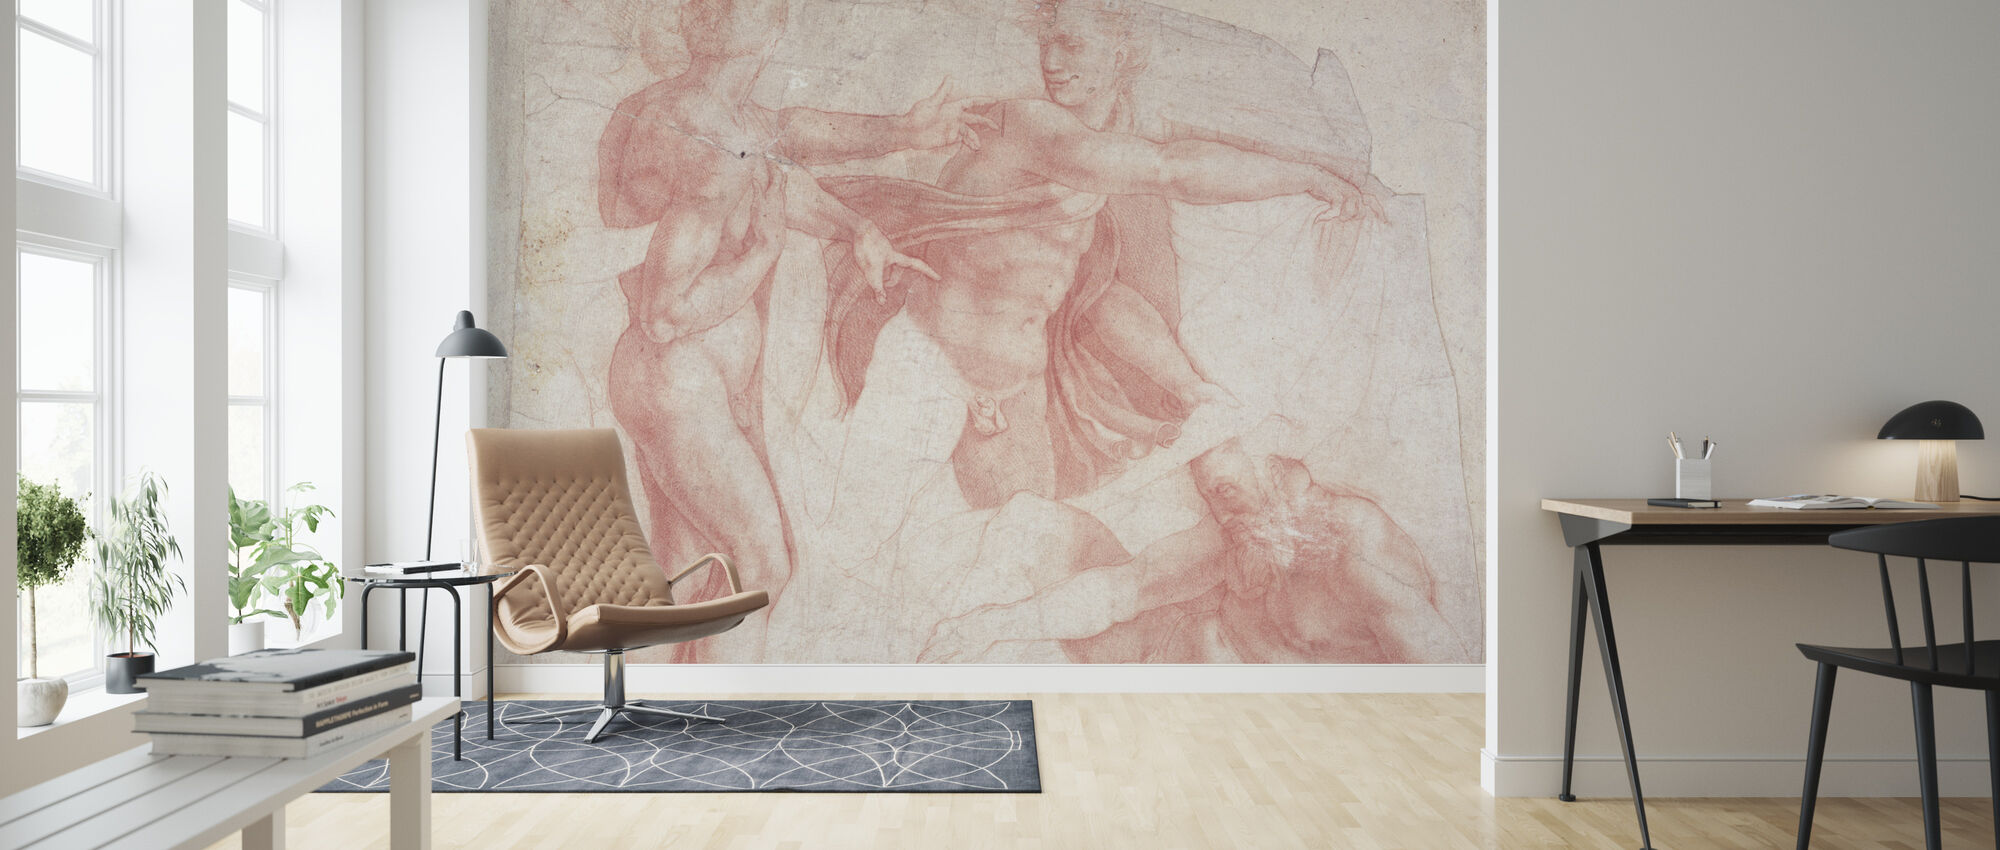 Studies of Male Nudes - Michelangelo Buonarroti - Wallpaper - Living Room